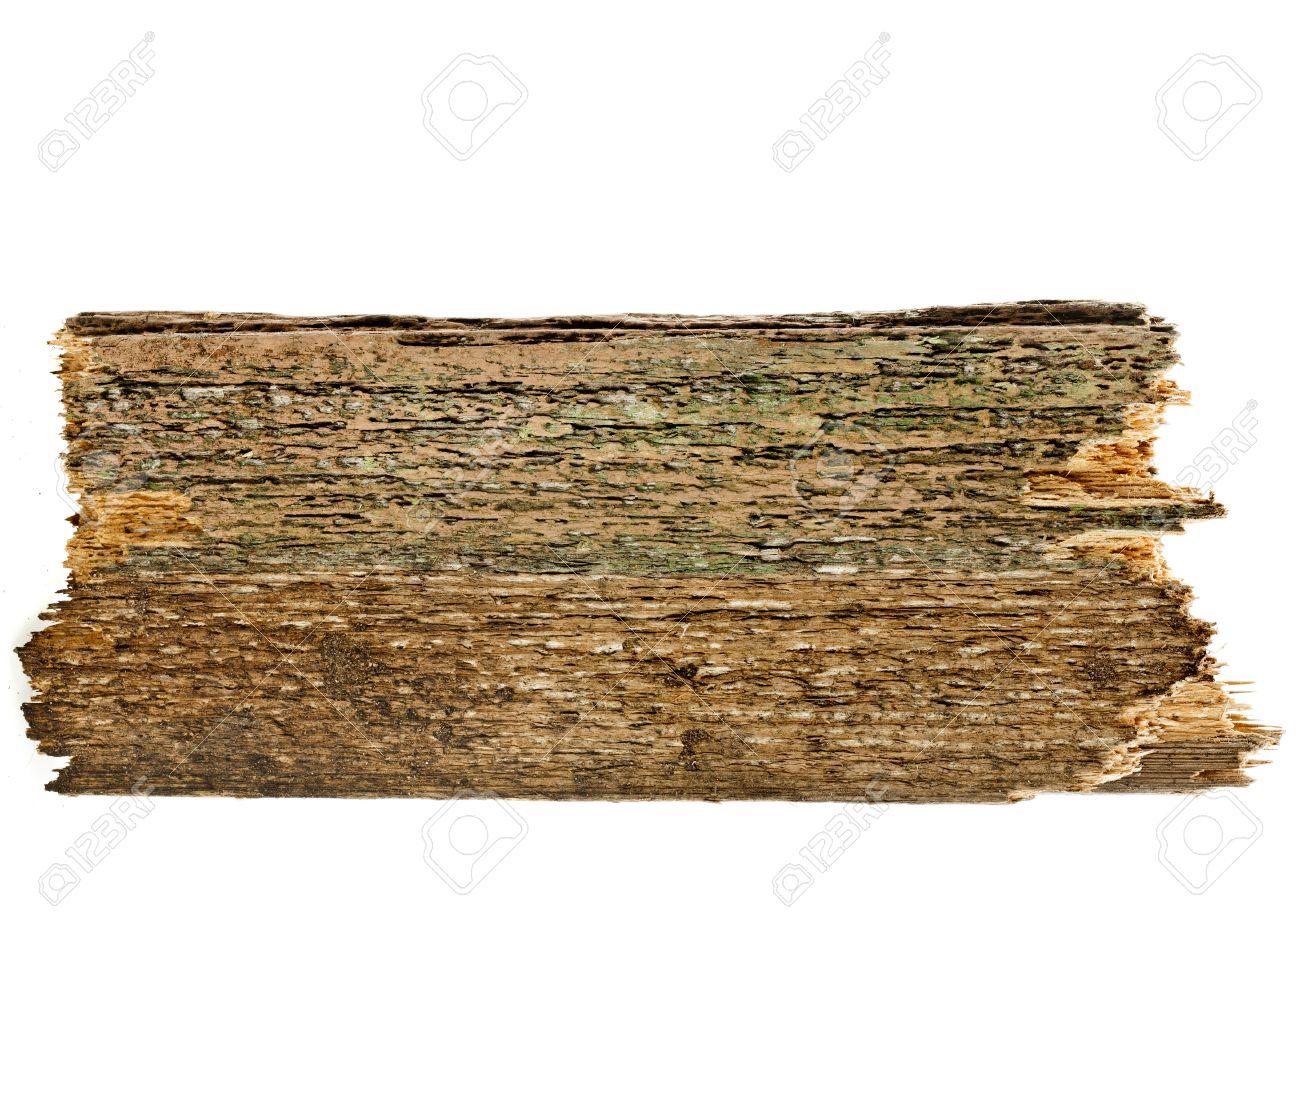 Old wood board Plank Old Wood Board Plank Isolated On White Stock Photo 17736227 123rfcom Old Wood Board Plank Isolated On White Stock Photo Picture And